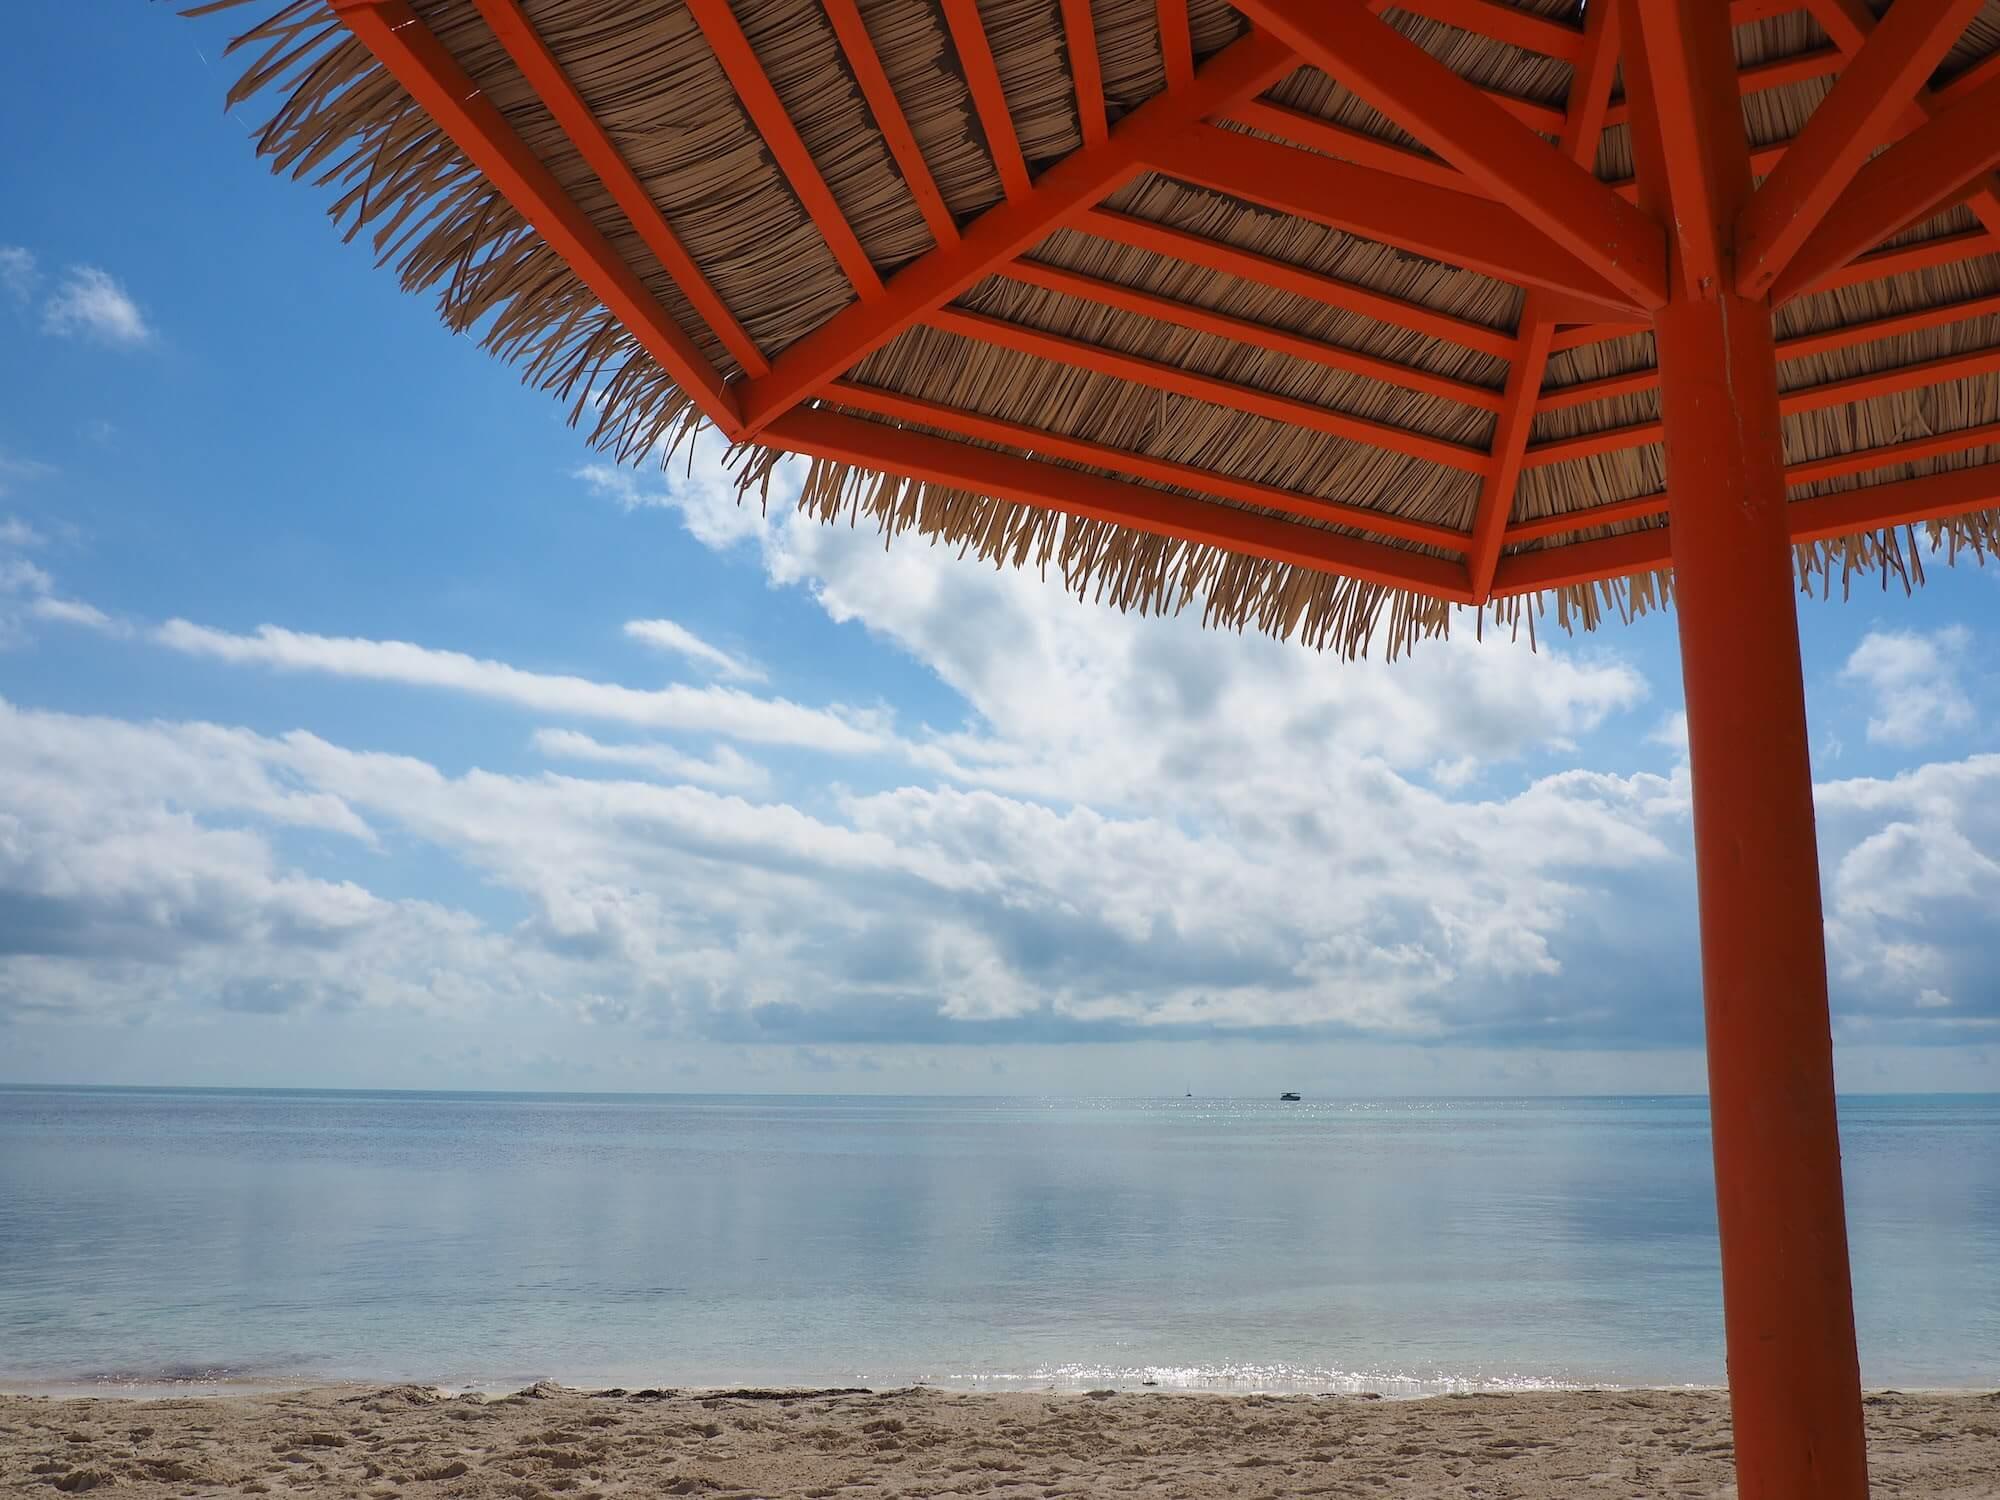 Corona hat unsere Malediven Reise durchkreuzt